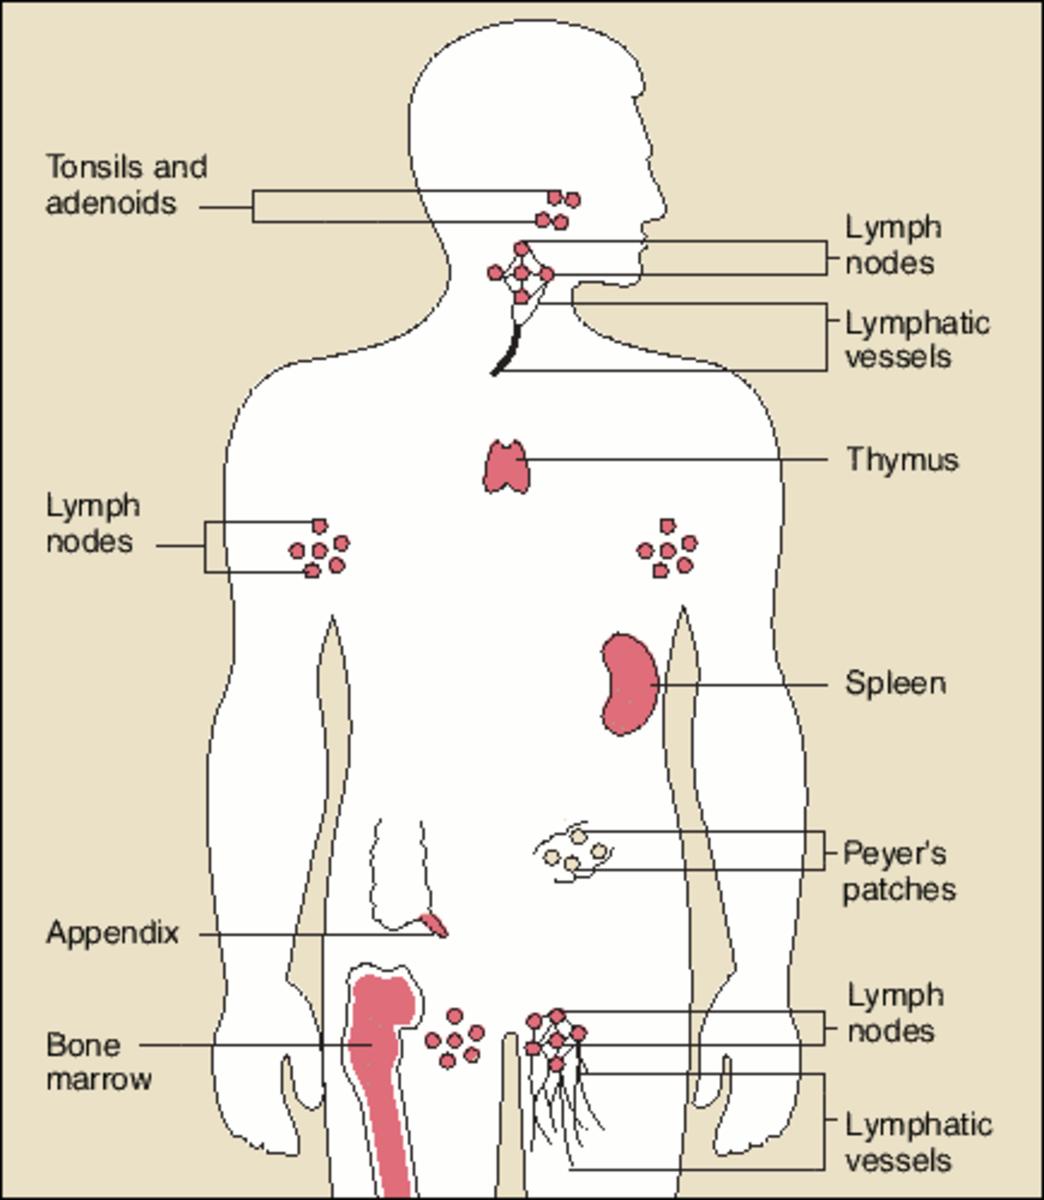 Key To Immune System Health